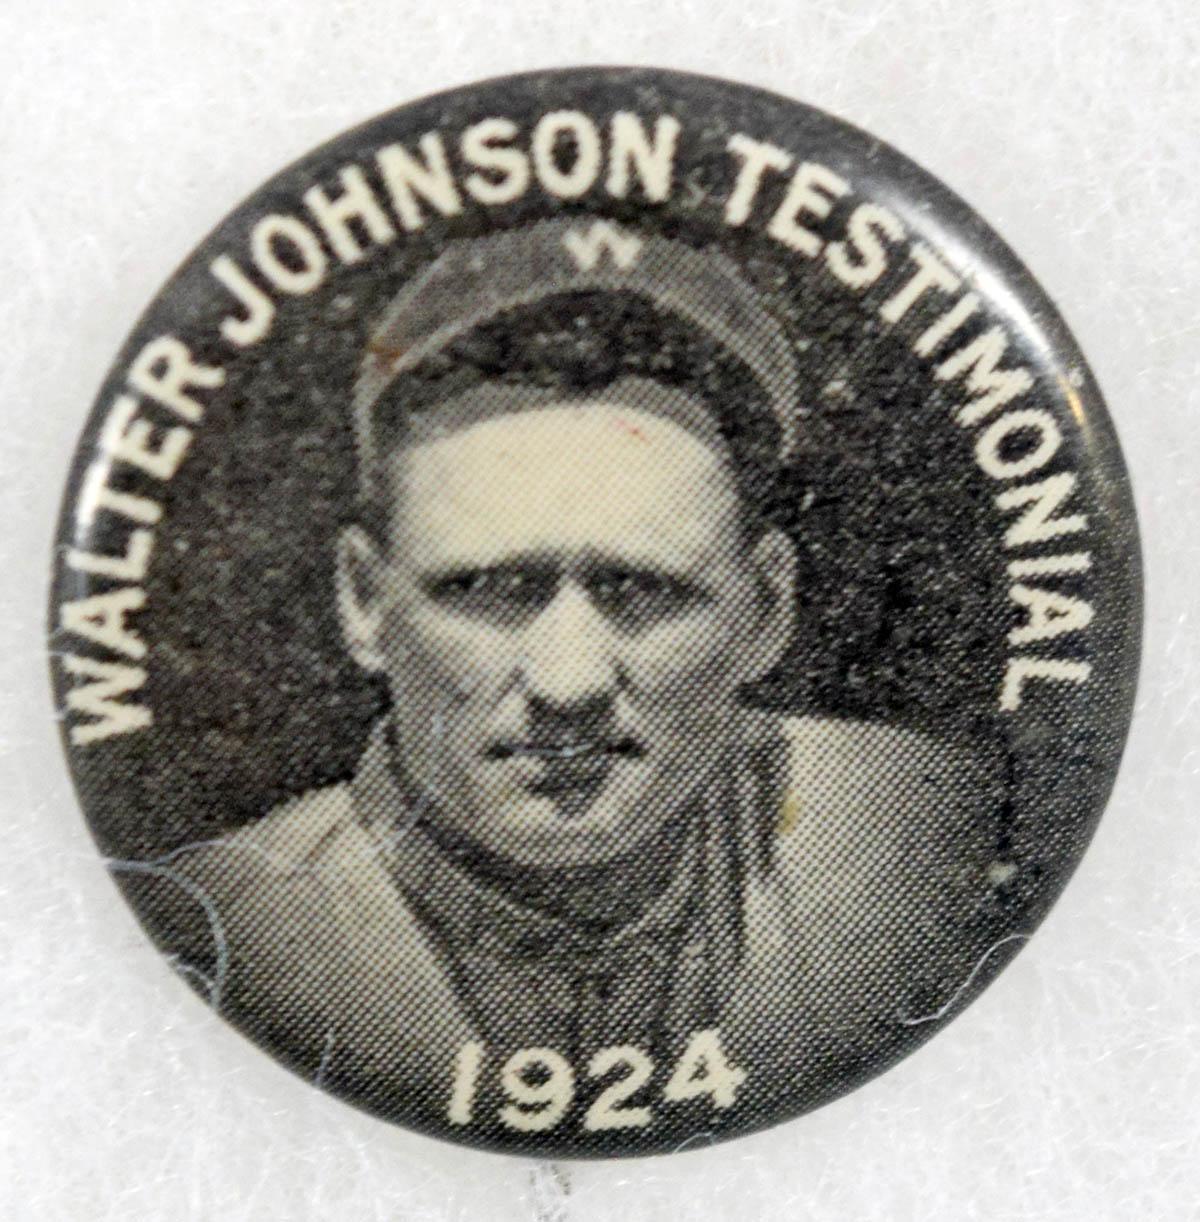 1924   Walter Johnson Day Pin